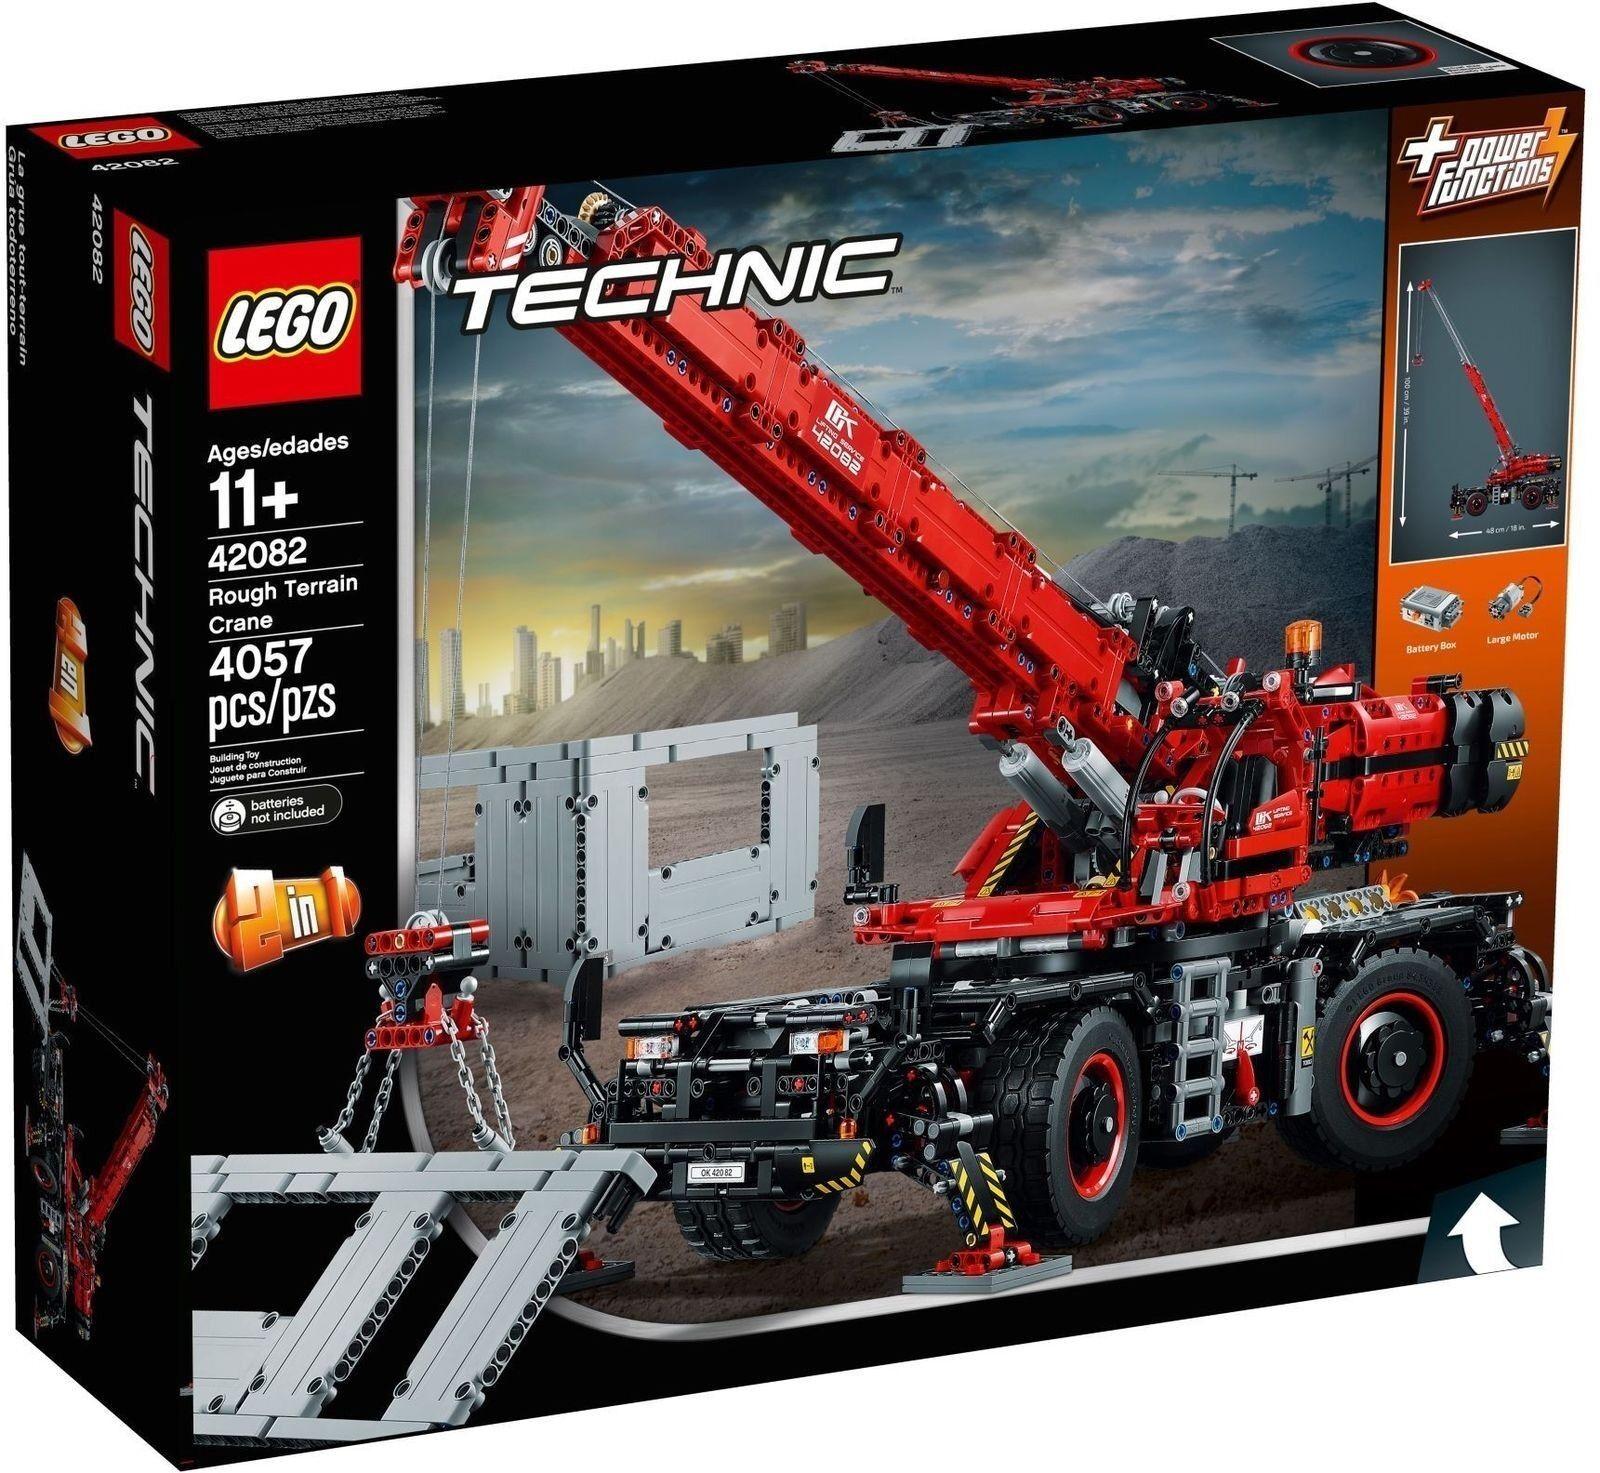 LEGO TECHNIC GRANDE GRU MOBILE - LEGO 42082